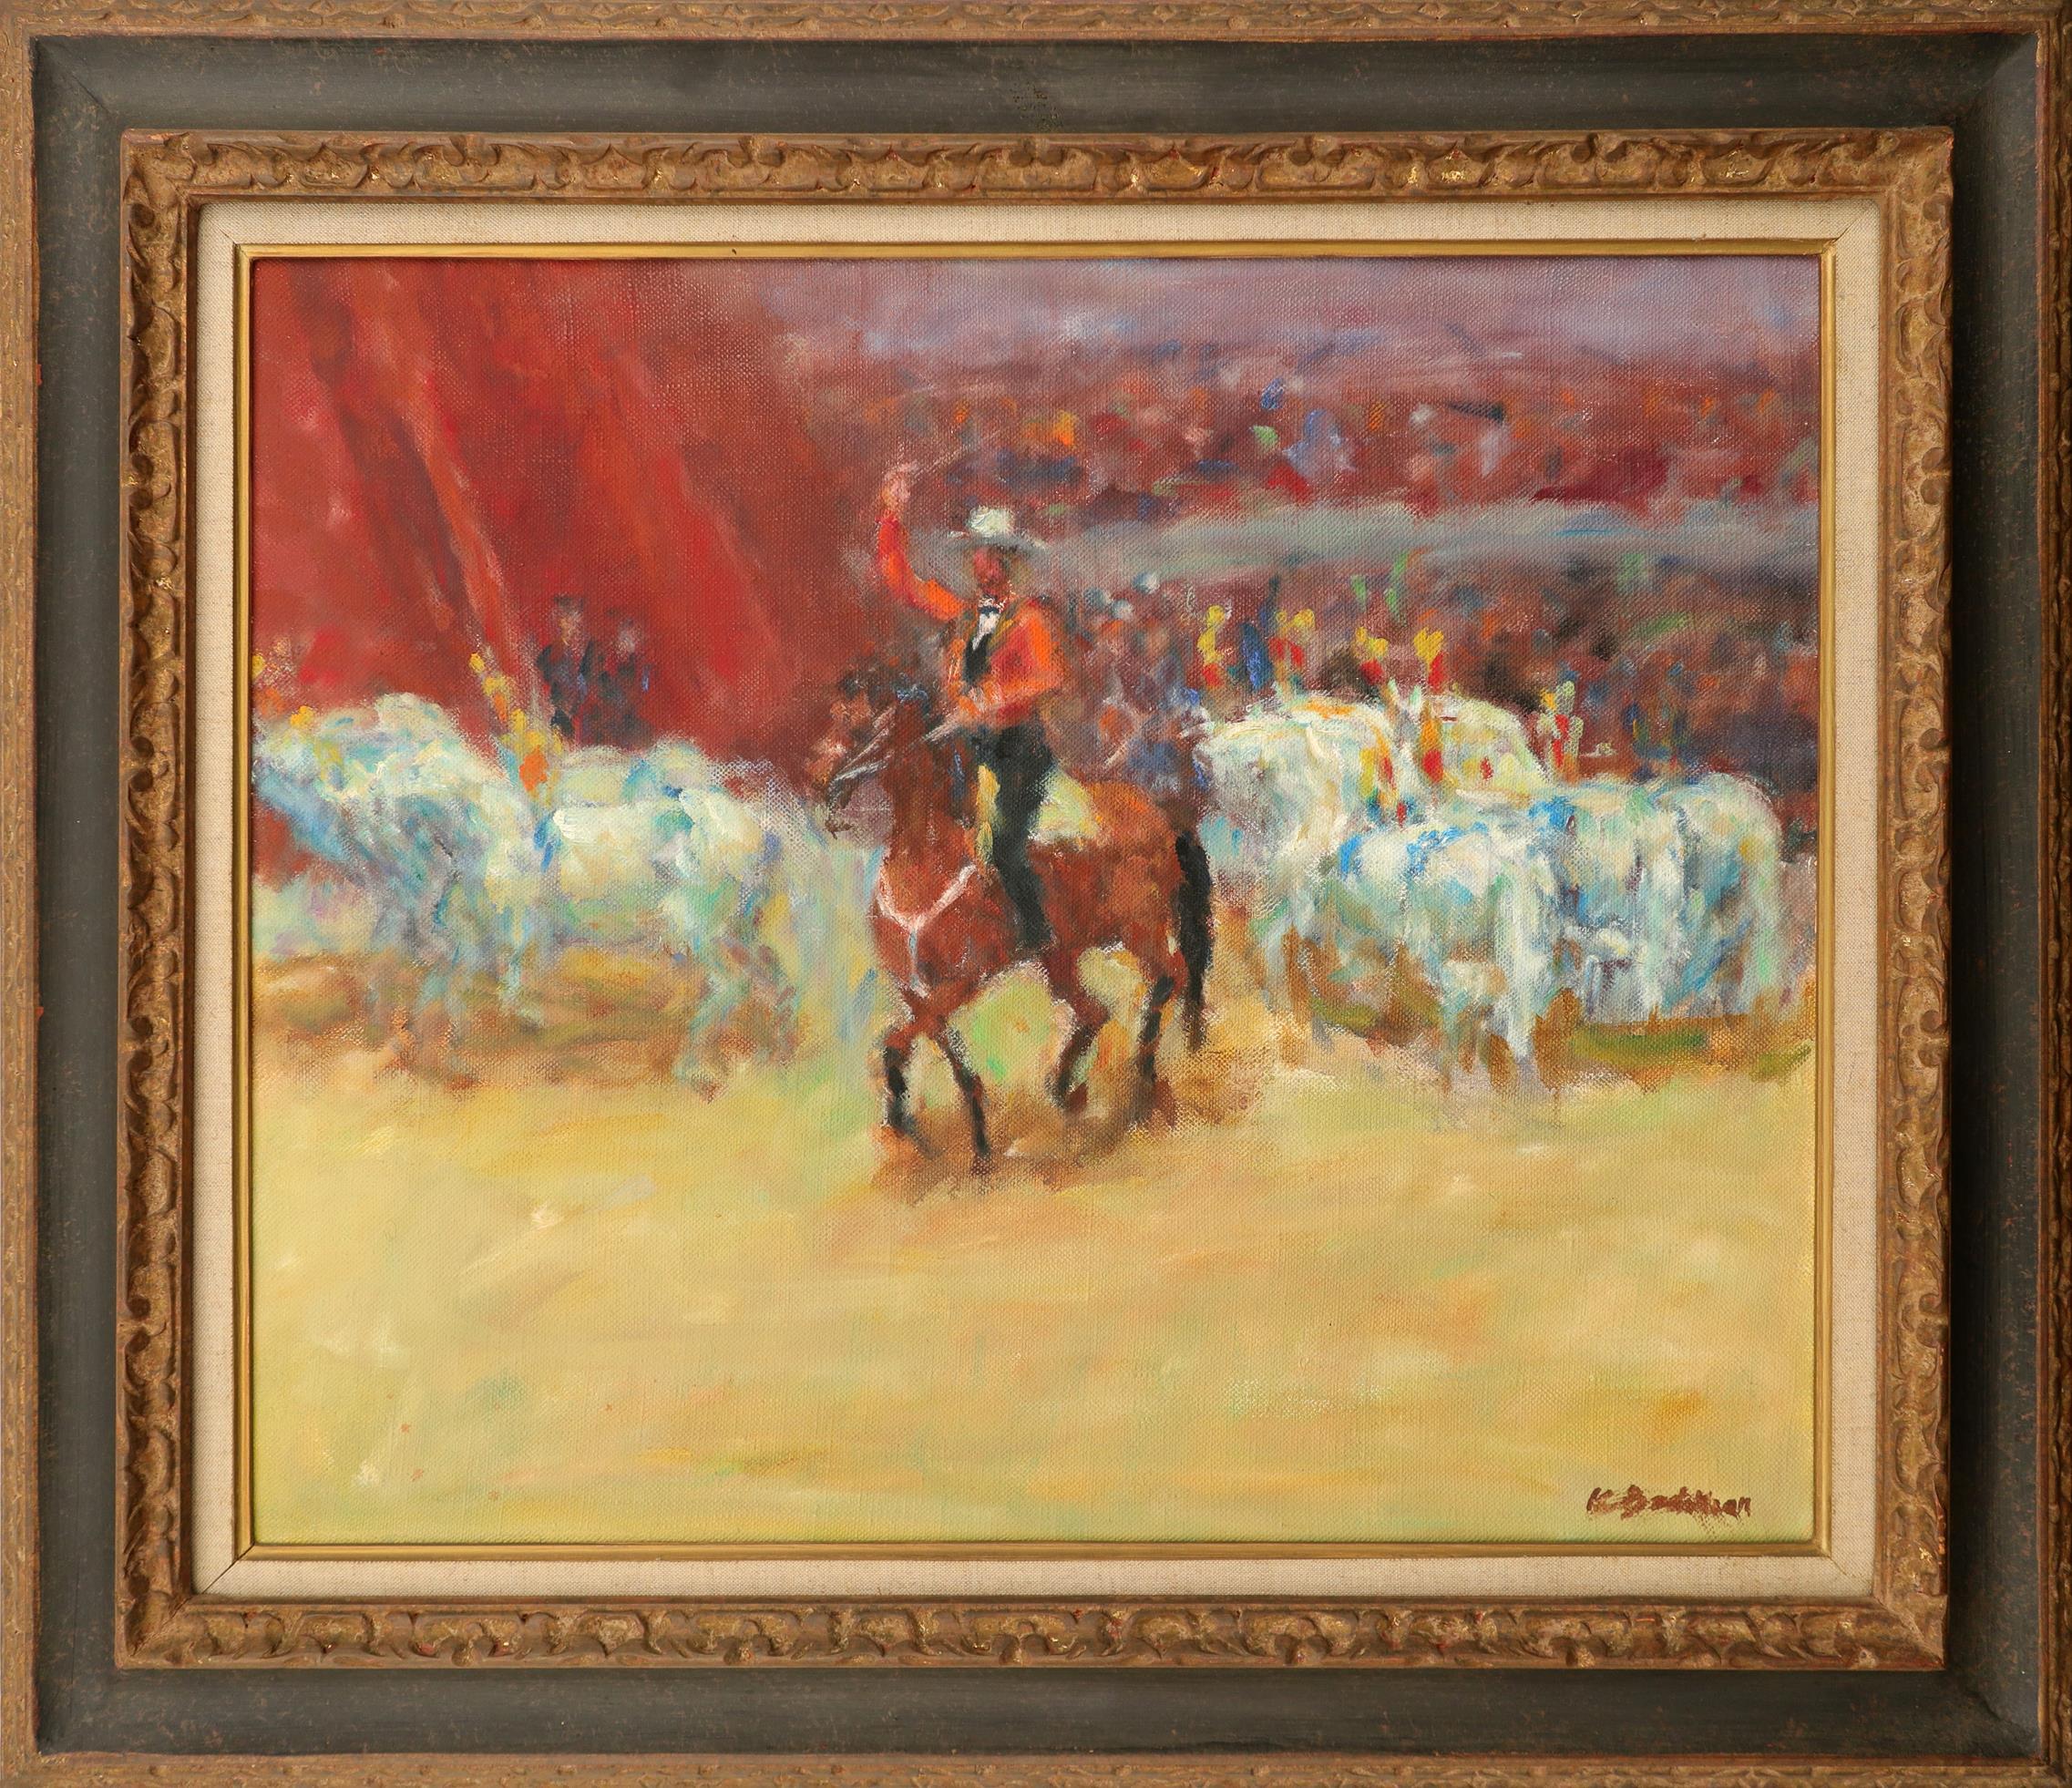 Krikor Bédikian (Turkish 1908-1981) Circus procession Signed K Bedikian (lower right) Oil on - Image 2 of 3